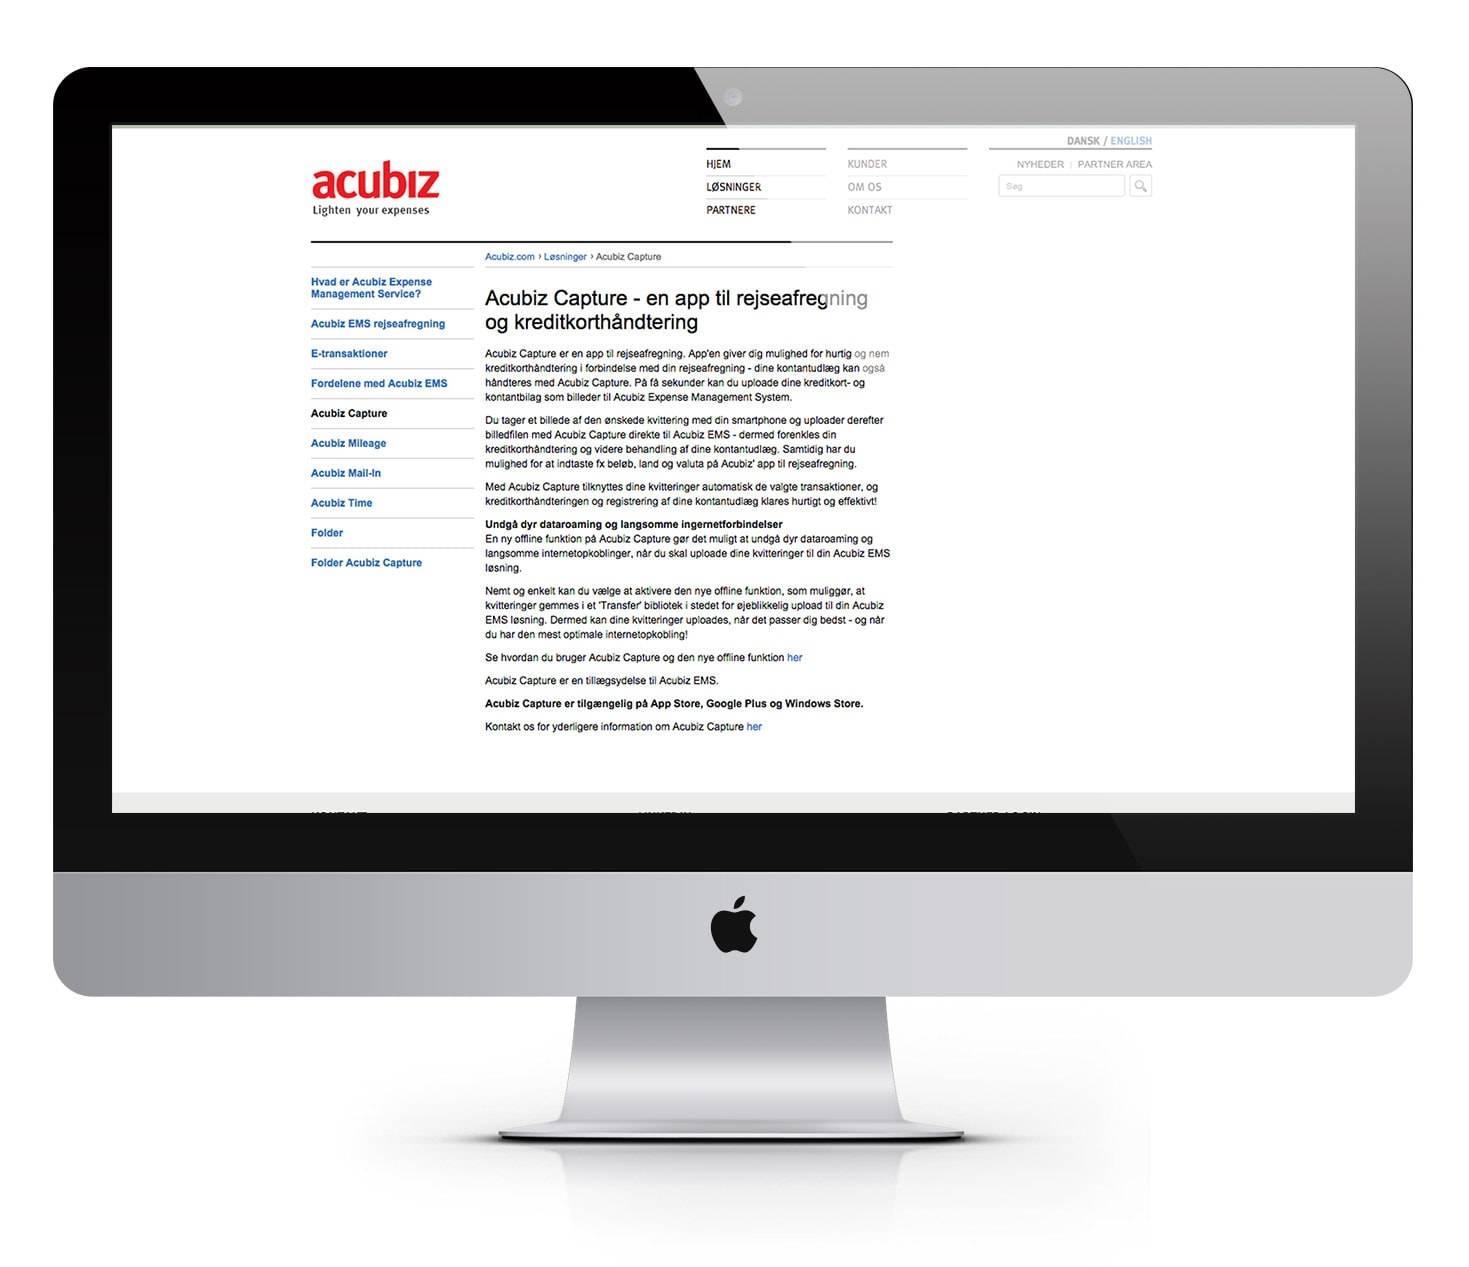 acubiz oprindelig hjemmeside